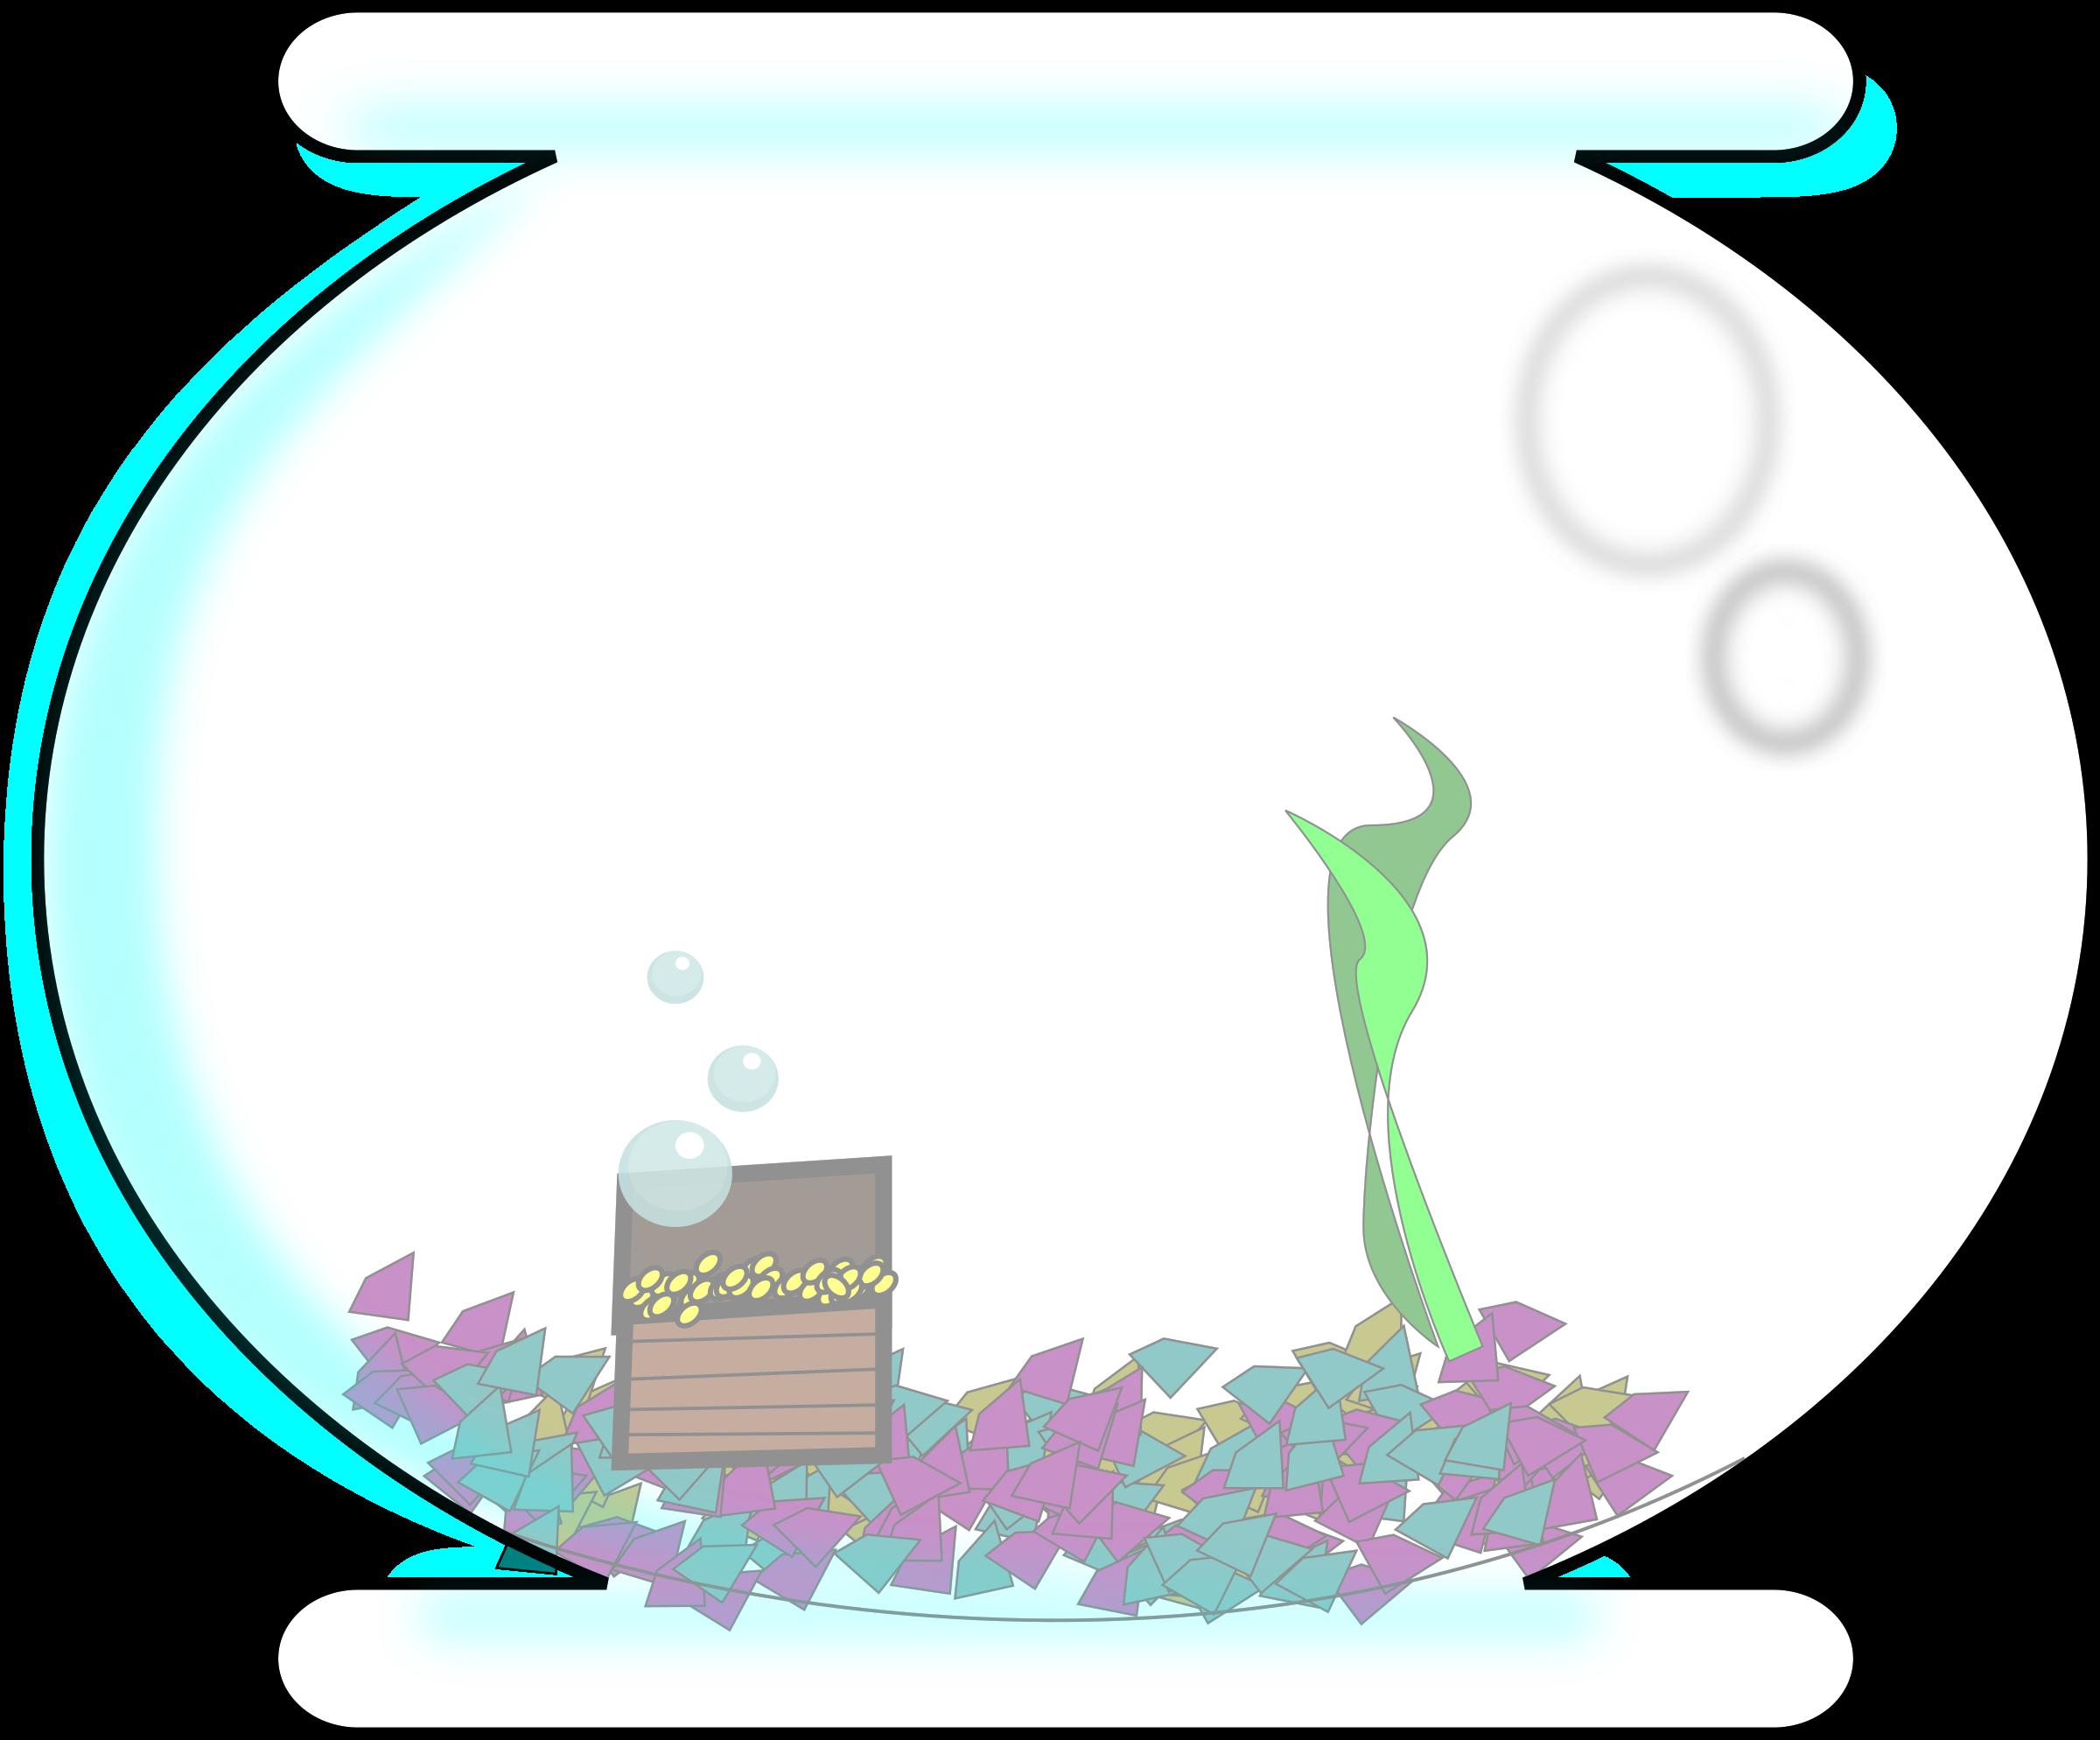 Fishbowl clipart transparent. Big image png